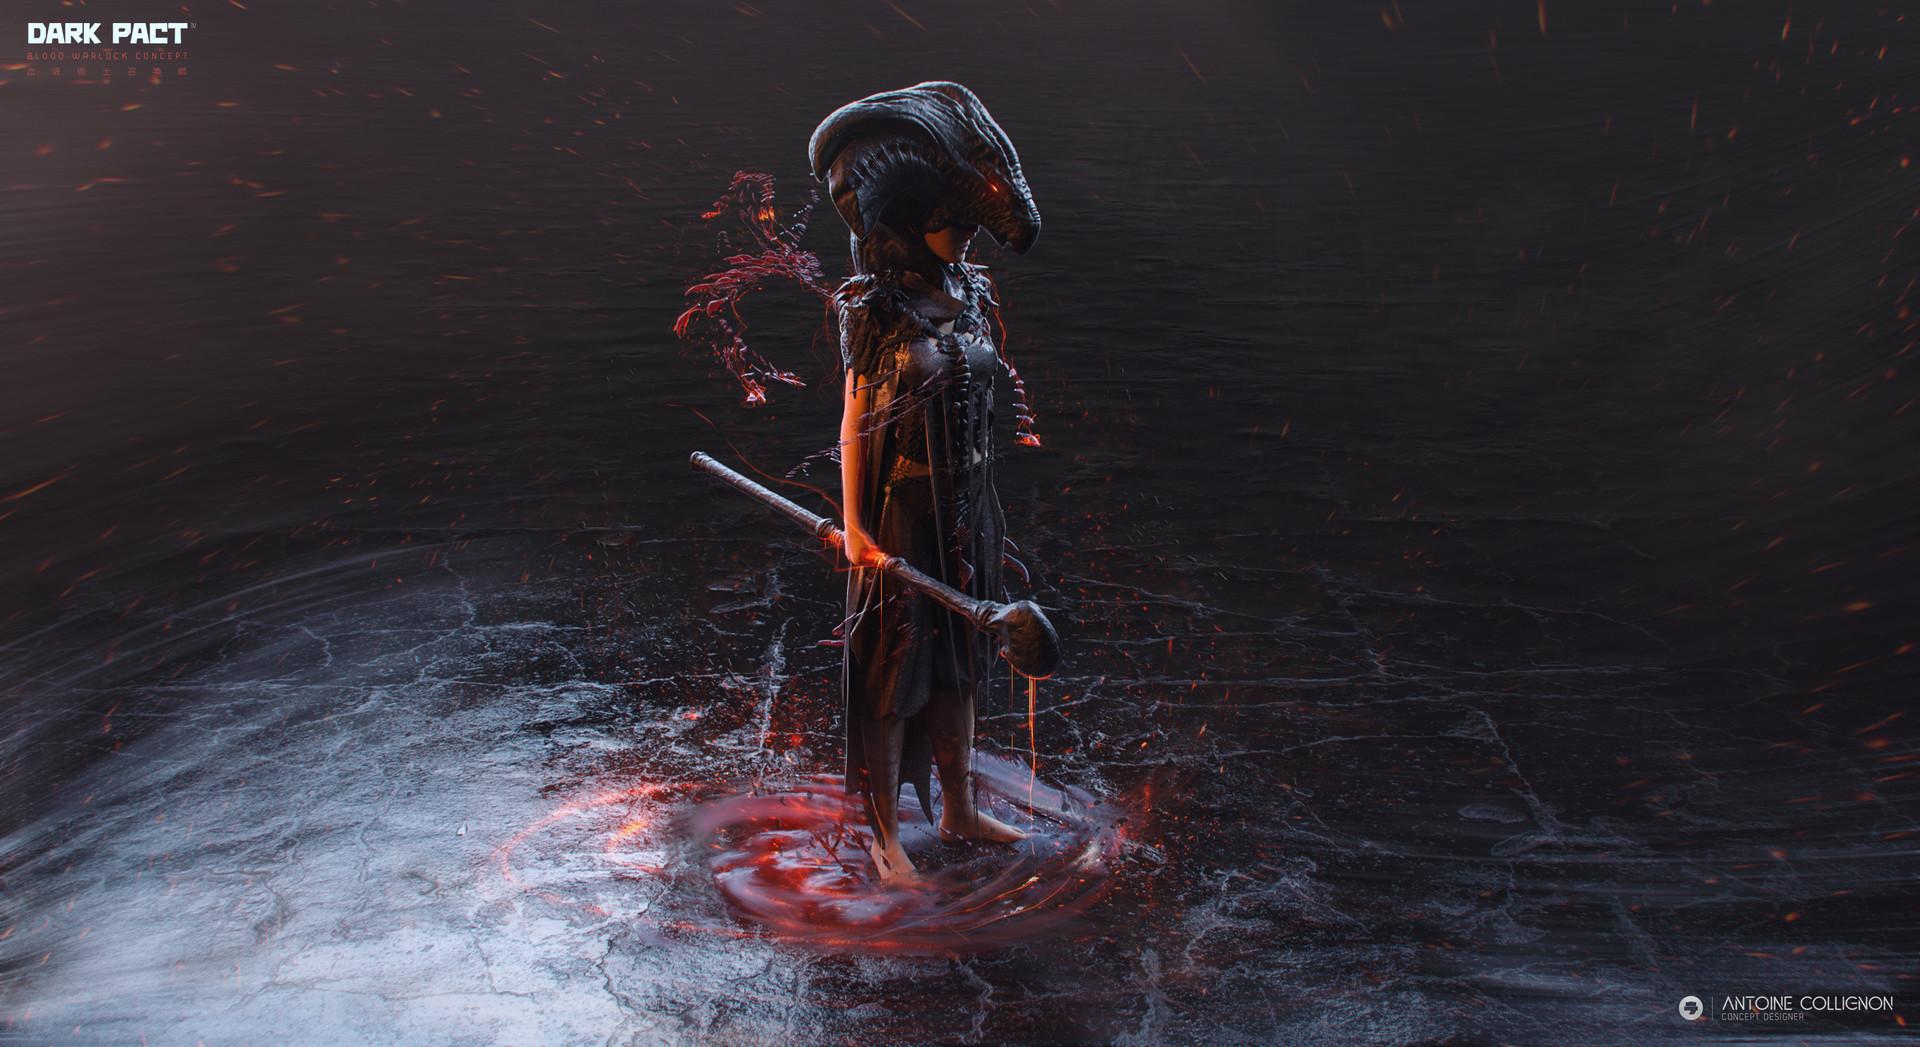 Antoine collignon dark pact characterdesign mmo bloodwarlock by antoine collignon 3